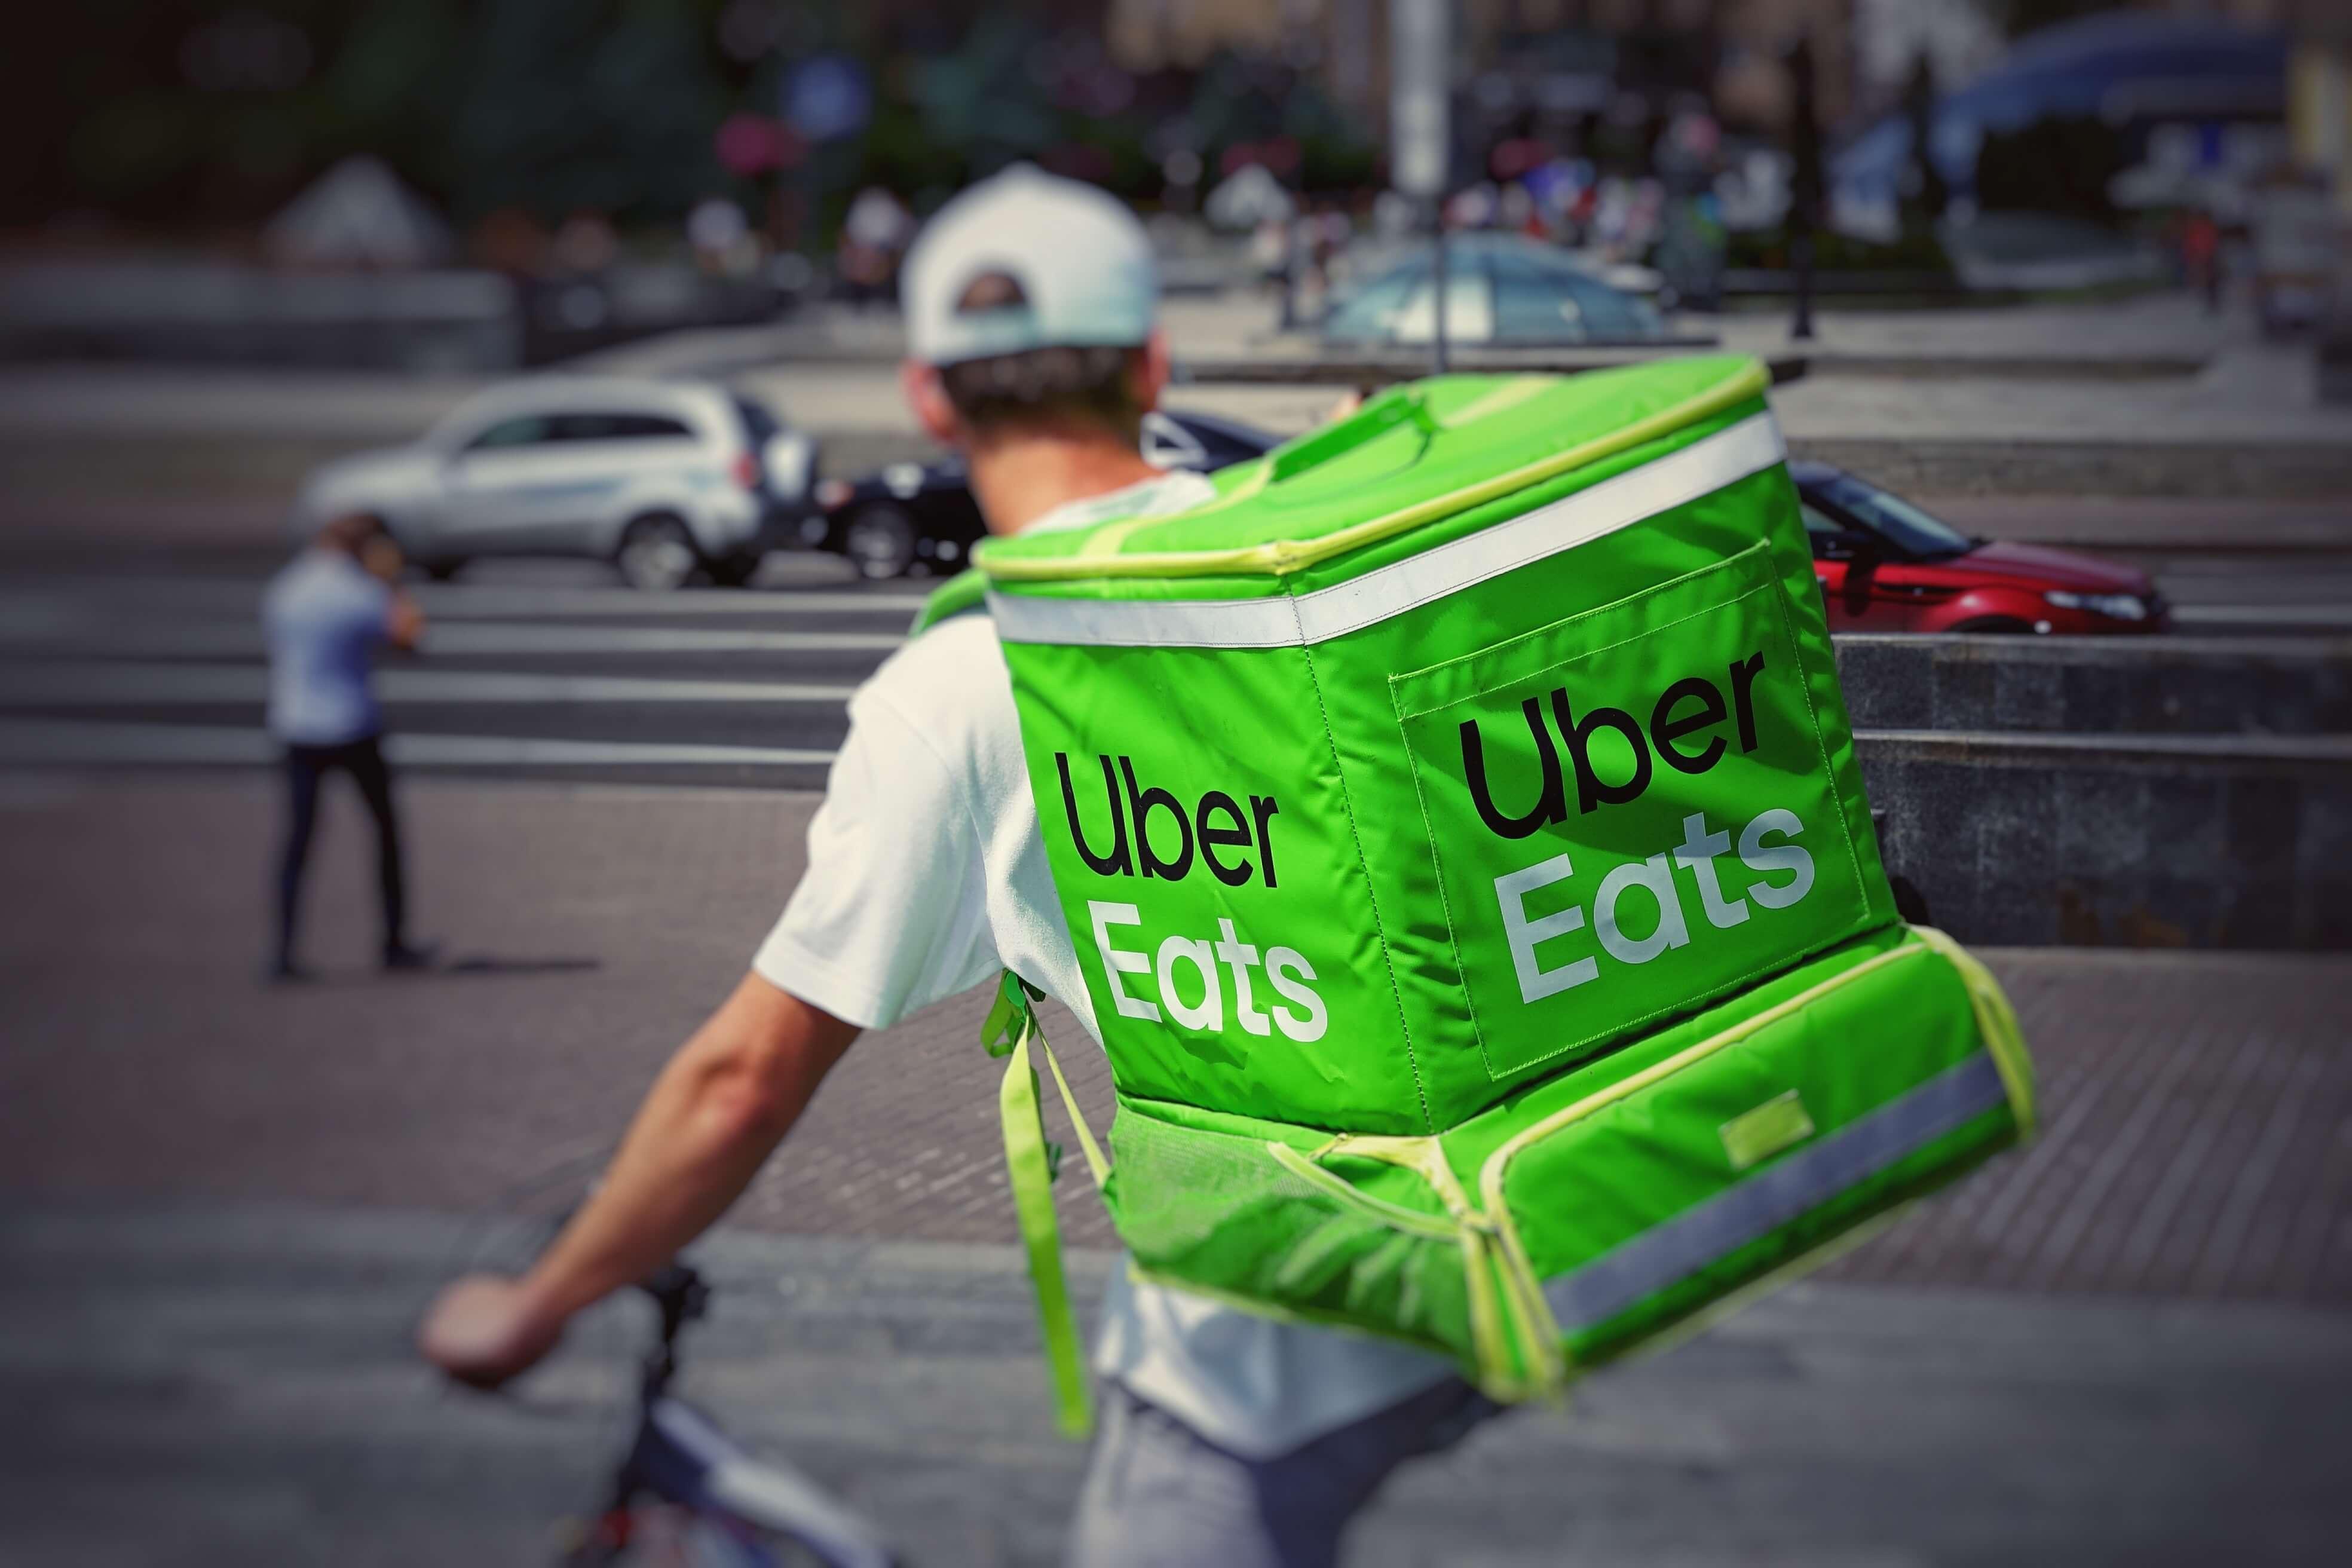 【UberEats】AWSに障害。シェアサイクルが使用できない状態に!